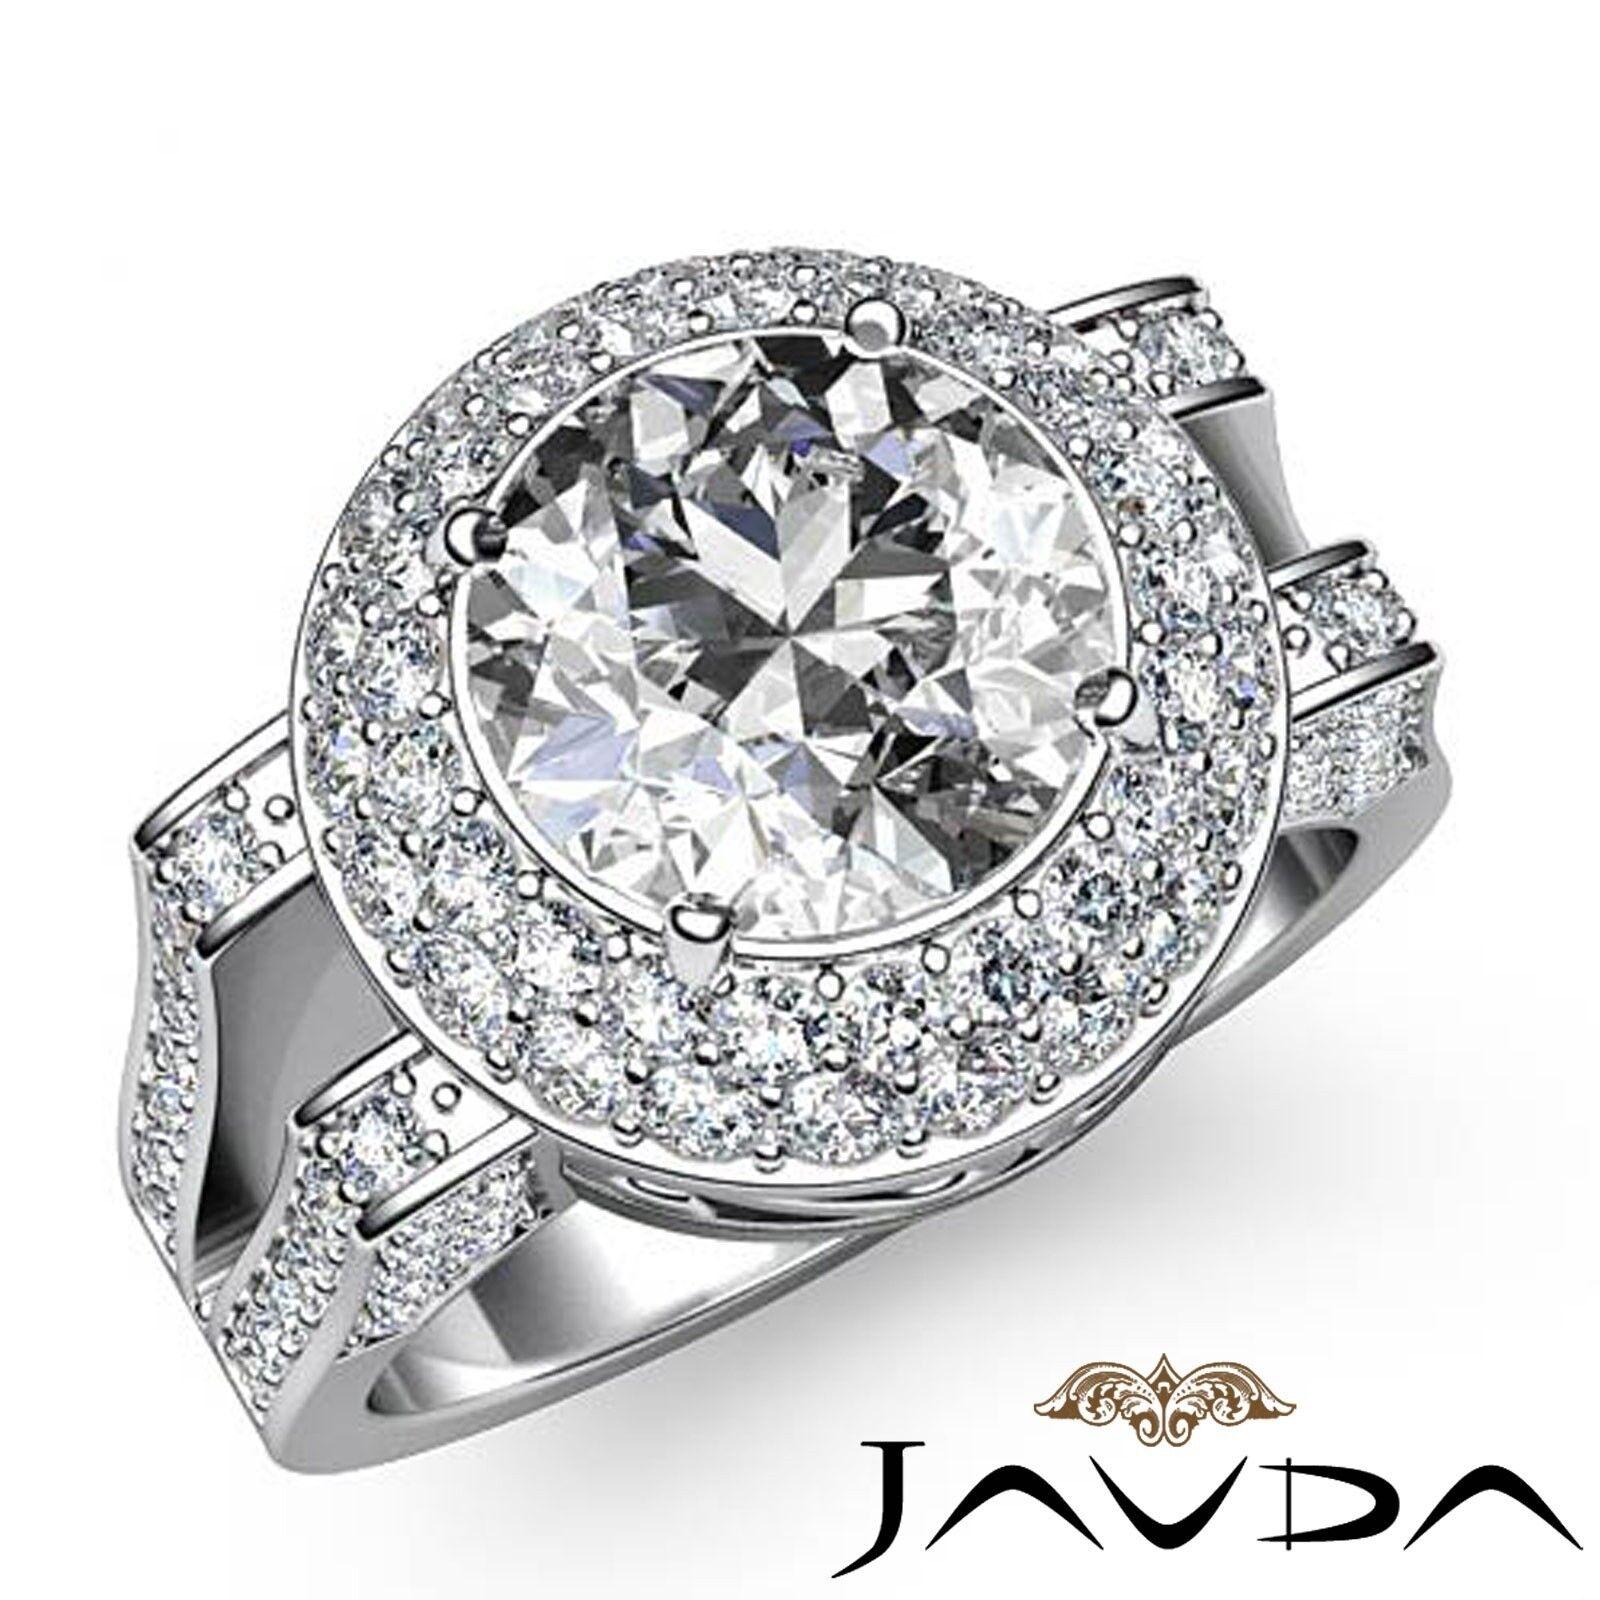 3.11ct Gala Halo Split Shank Round Diamond Engagement Ring GIA I-VVS2 White Gold